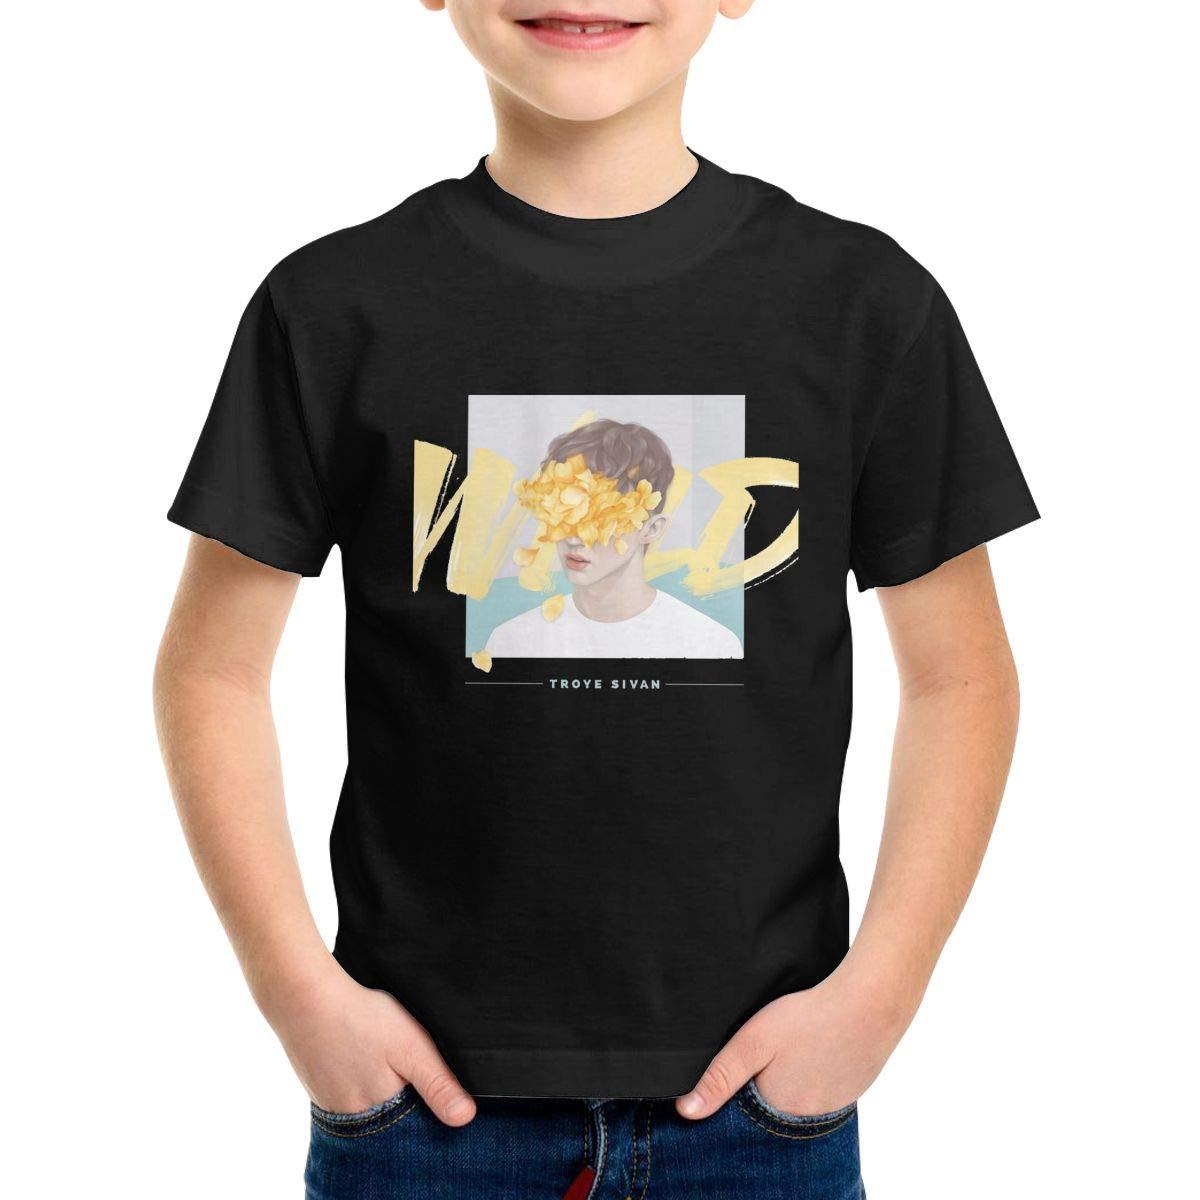 Patricia M Rivas Troye Sivan Toddler Little Boys Cute Black Cotton Tees Shirt Tops